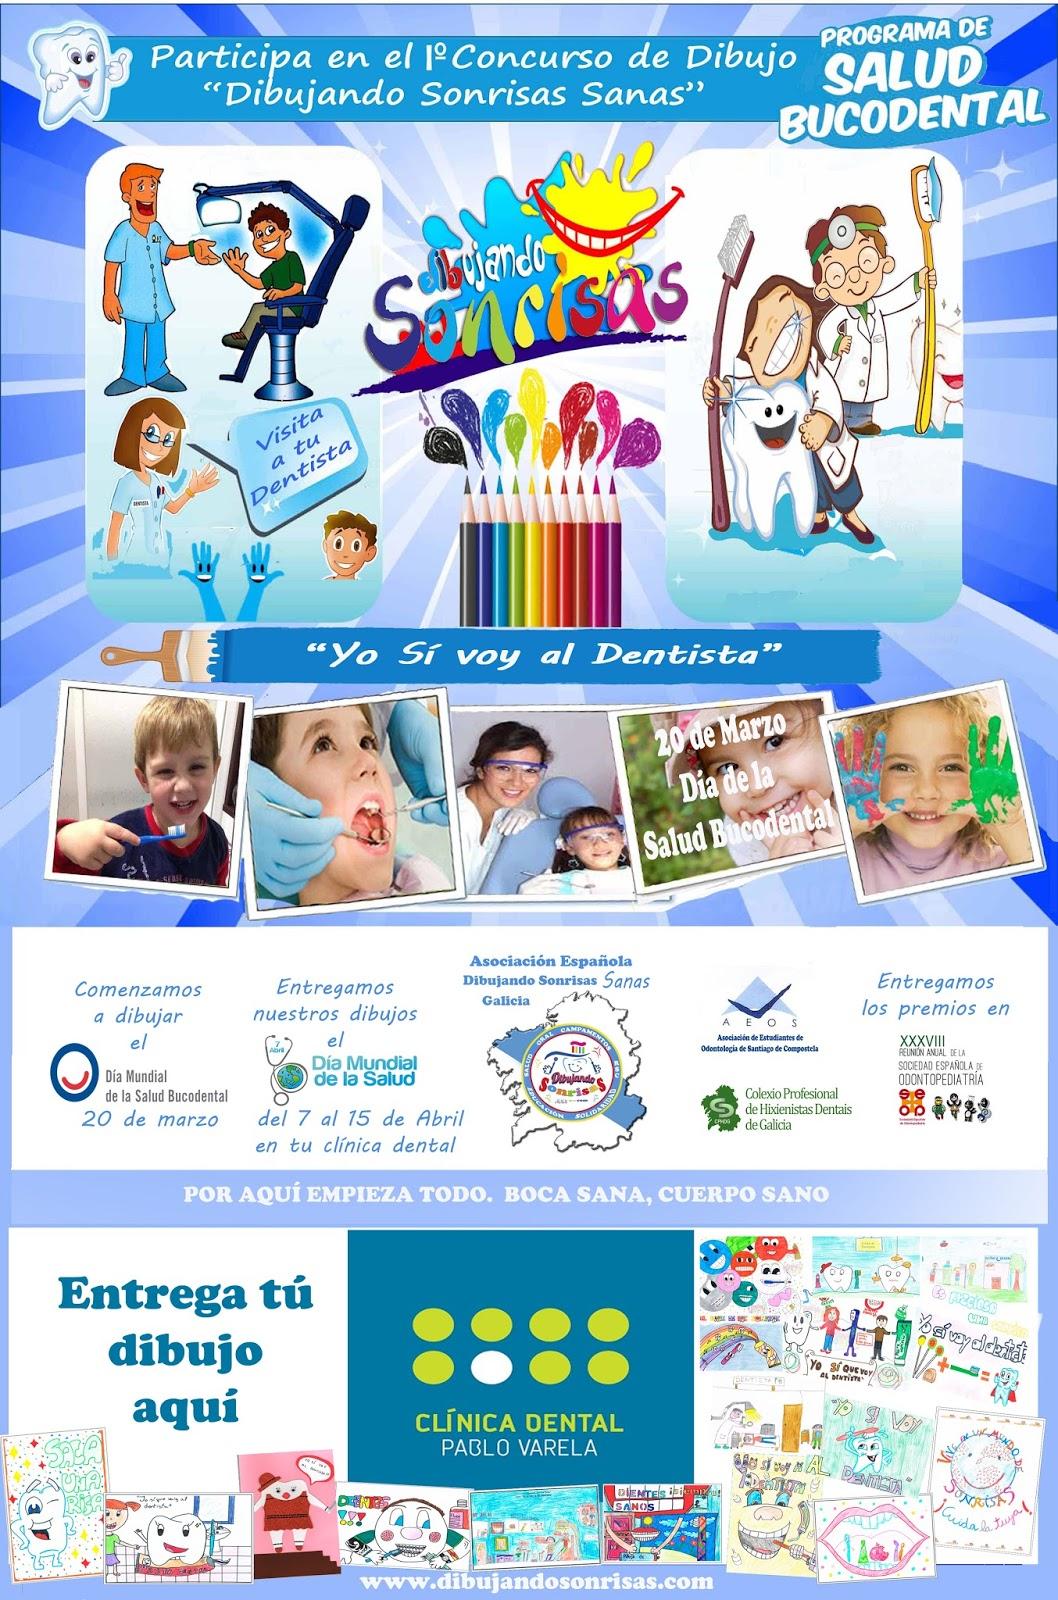 Clinica dental pablo varela concurso de dibujo - Concurso de dibujo 2017 ...